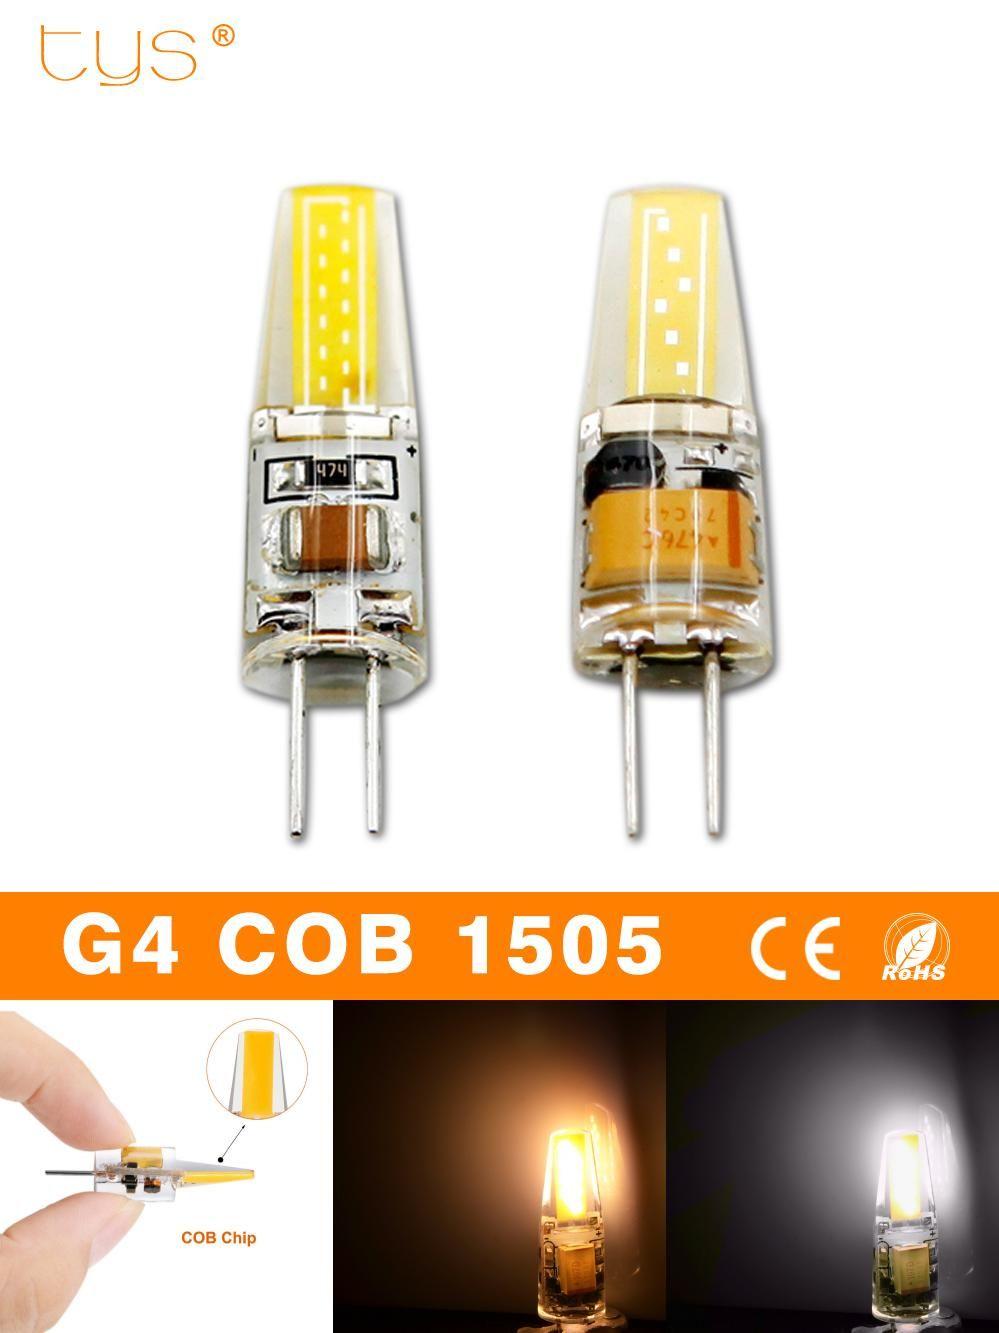 Visit To Buy Bombillas Led Bulb G4 220v 6w Dimmable Lampada Led Lamp G4 Ac Dc 12v Cob Led Lights 360 Beam Angle Chandelier Replace H Lamp Led Bulb Led Lights